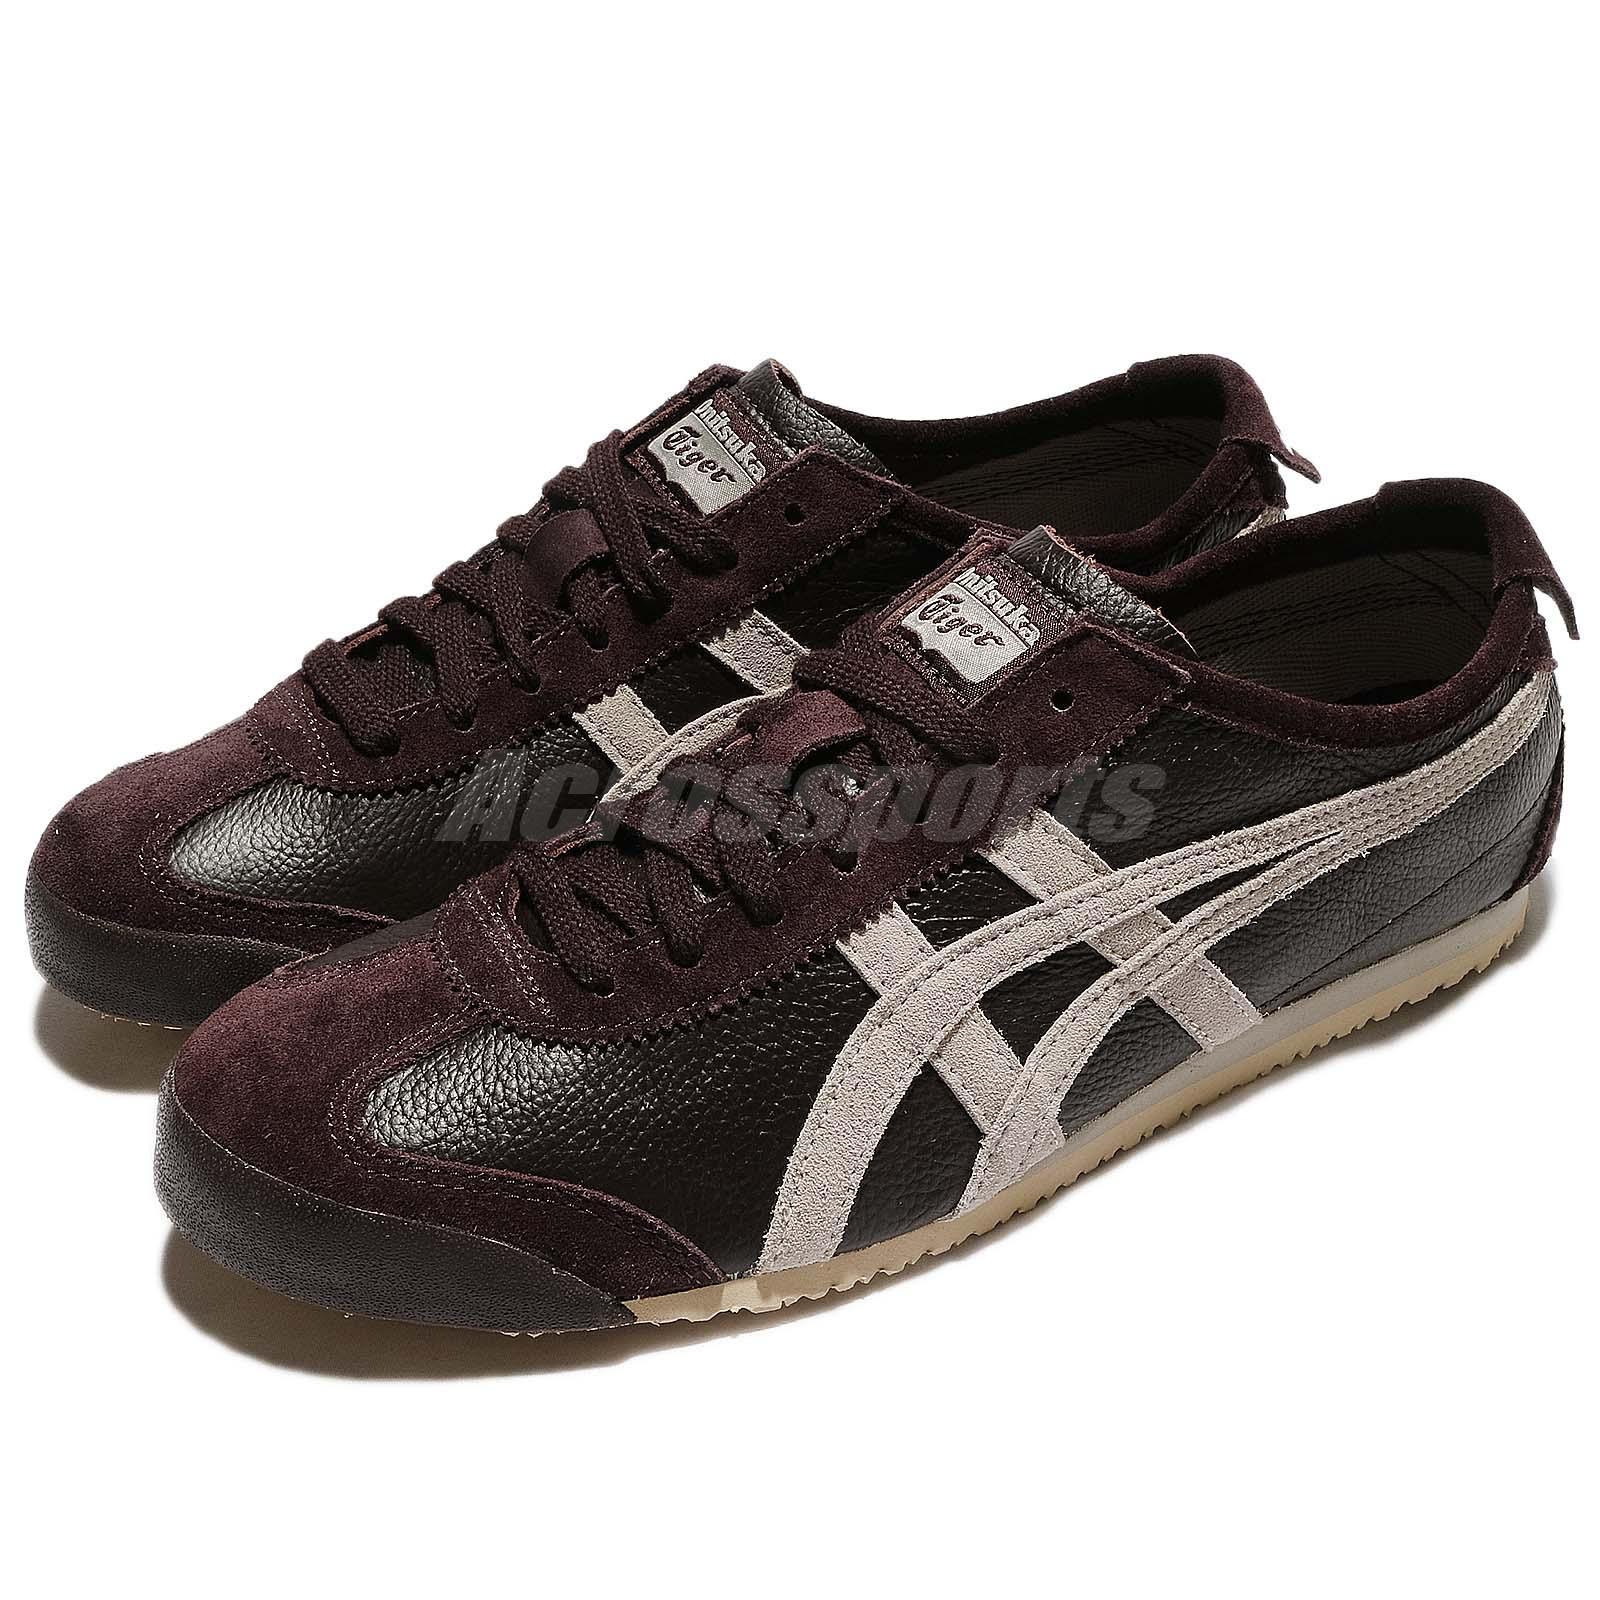 wholesale dealer 57906 cd664 Details about Asics Onitsuka Tiger Mexico 66 Vin Brown Grey Men Vintage  Shoes D2J4L-2912